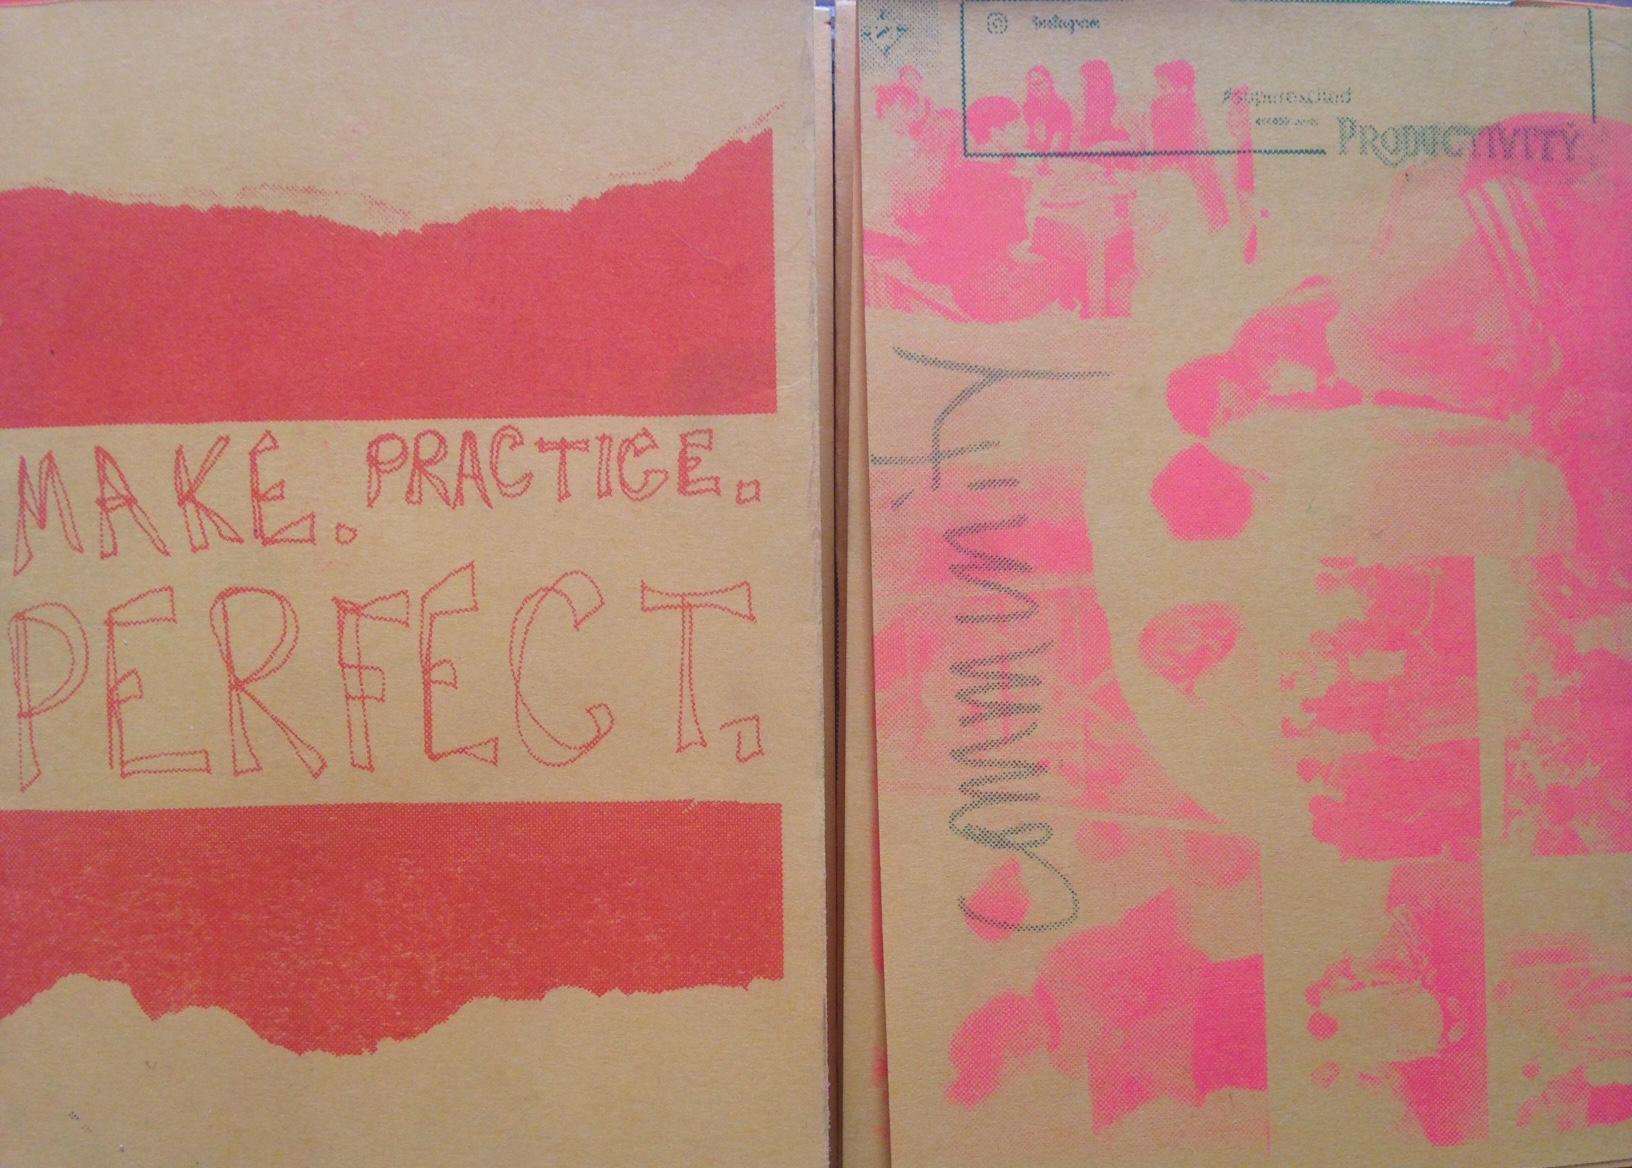 Make.Practice.Perfect: the zine